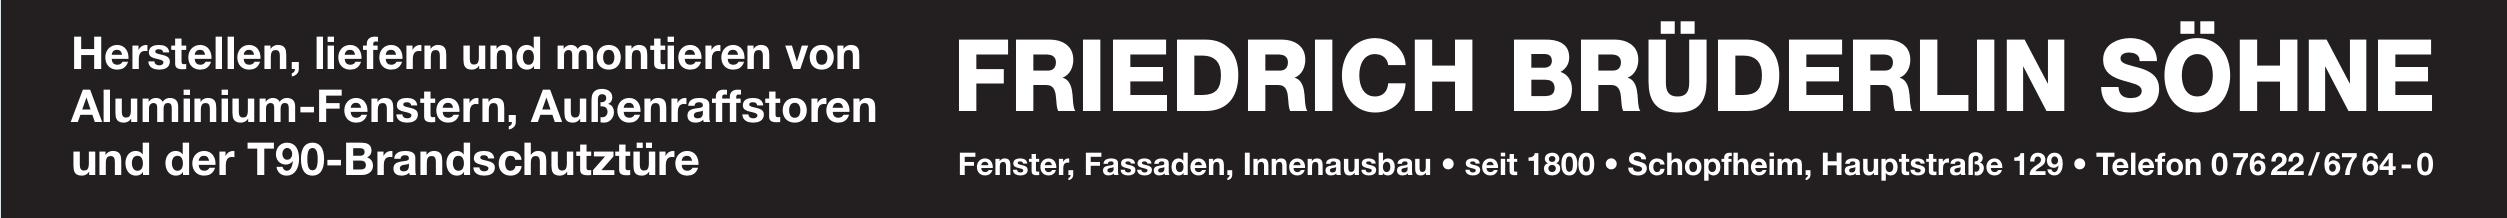 Fridrich Brüderlin Söhne